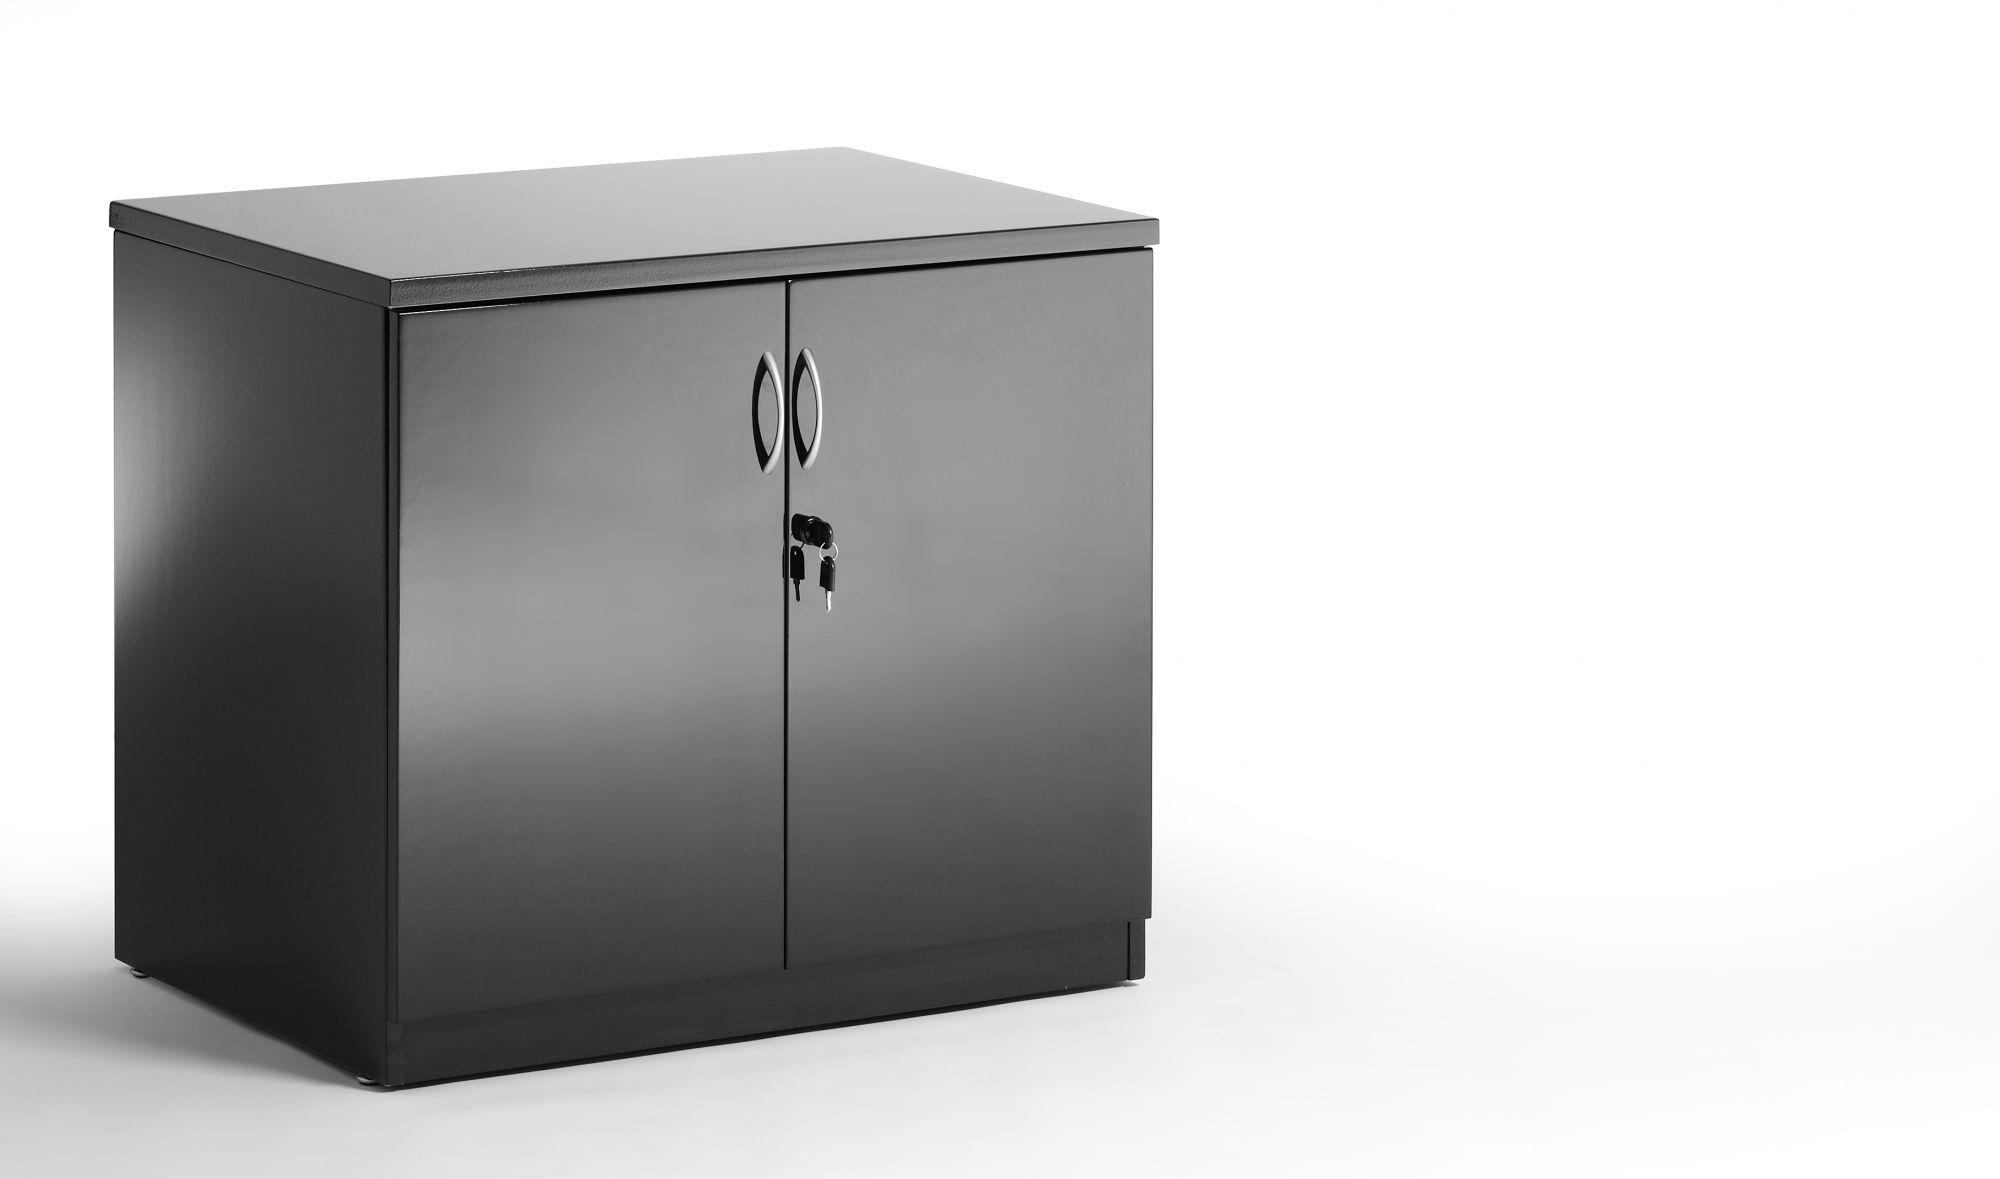 Black Hi Gloss cupboard